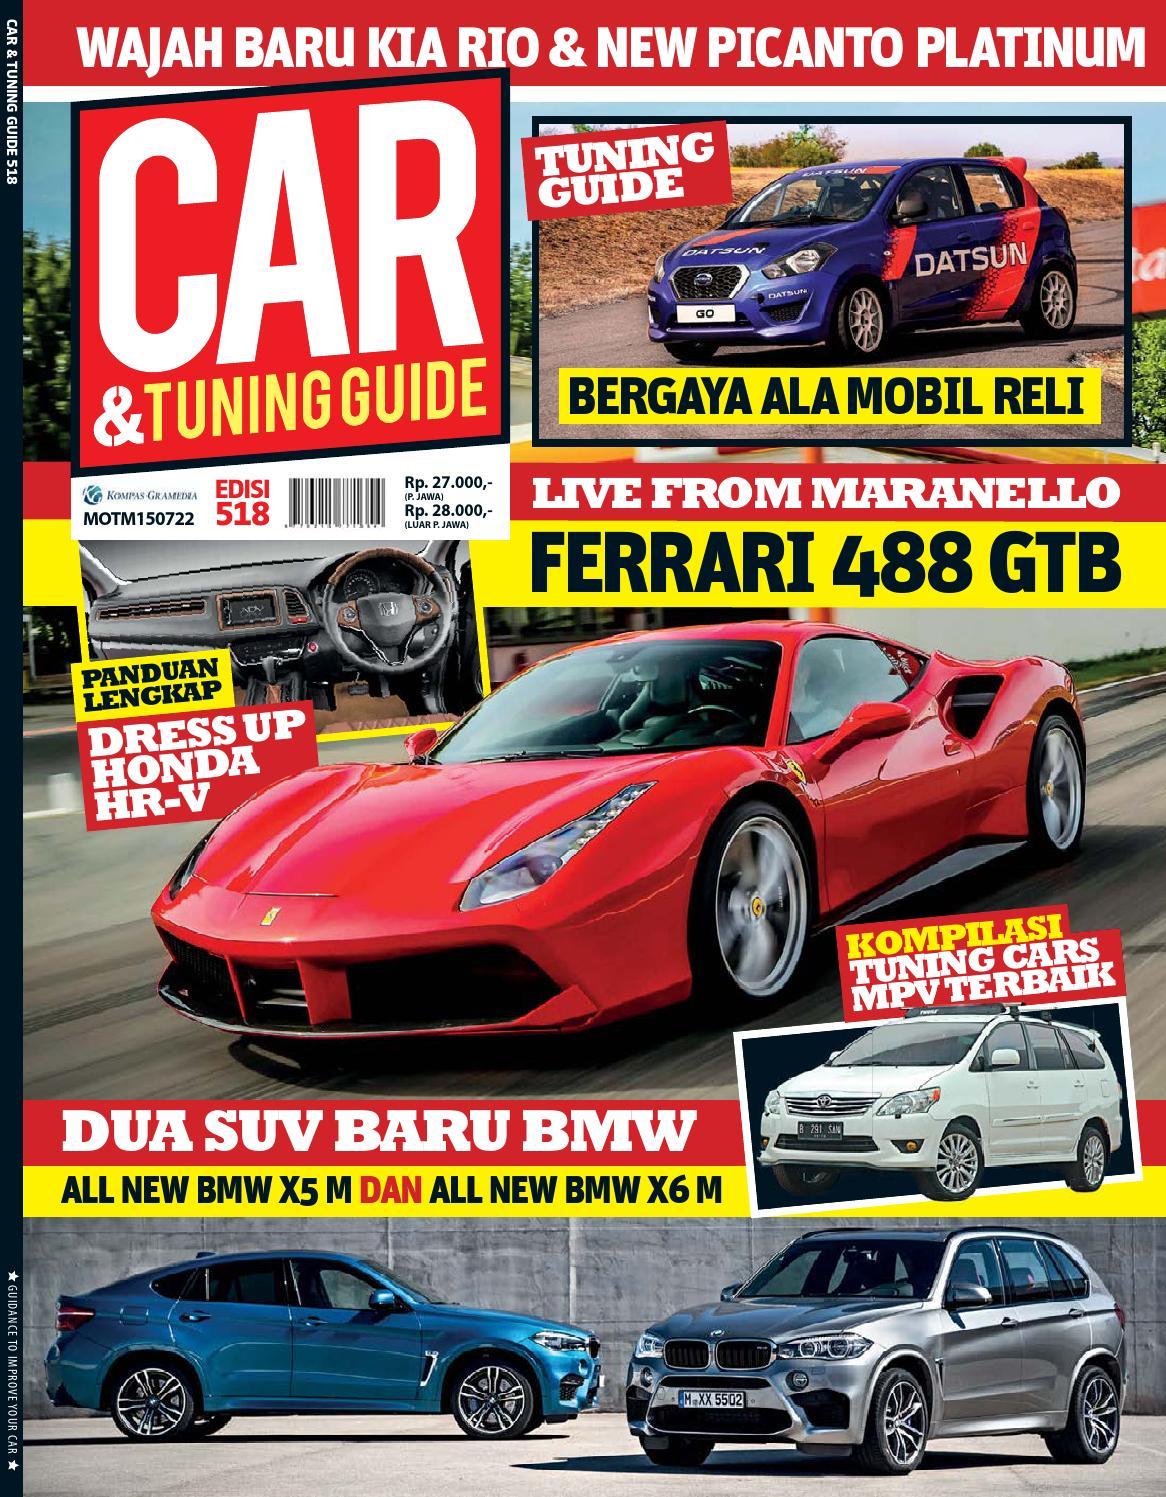 Car tuning guide edisi 518 2015 by thành phan issuu